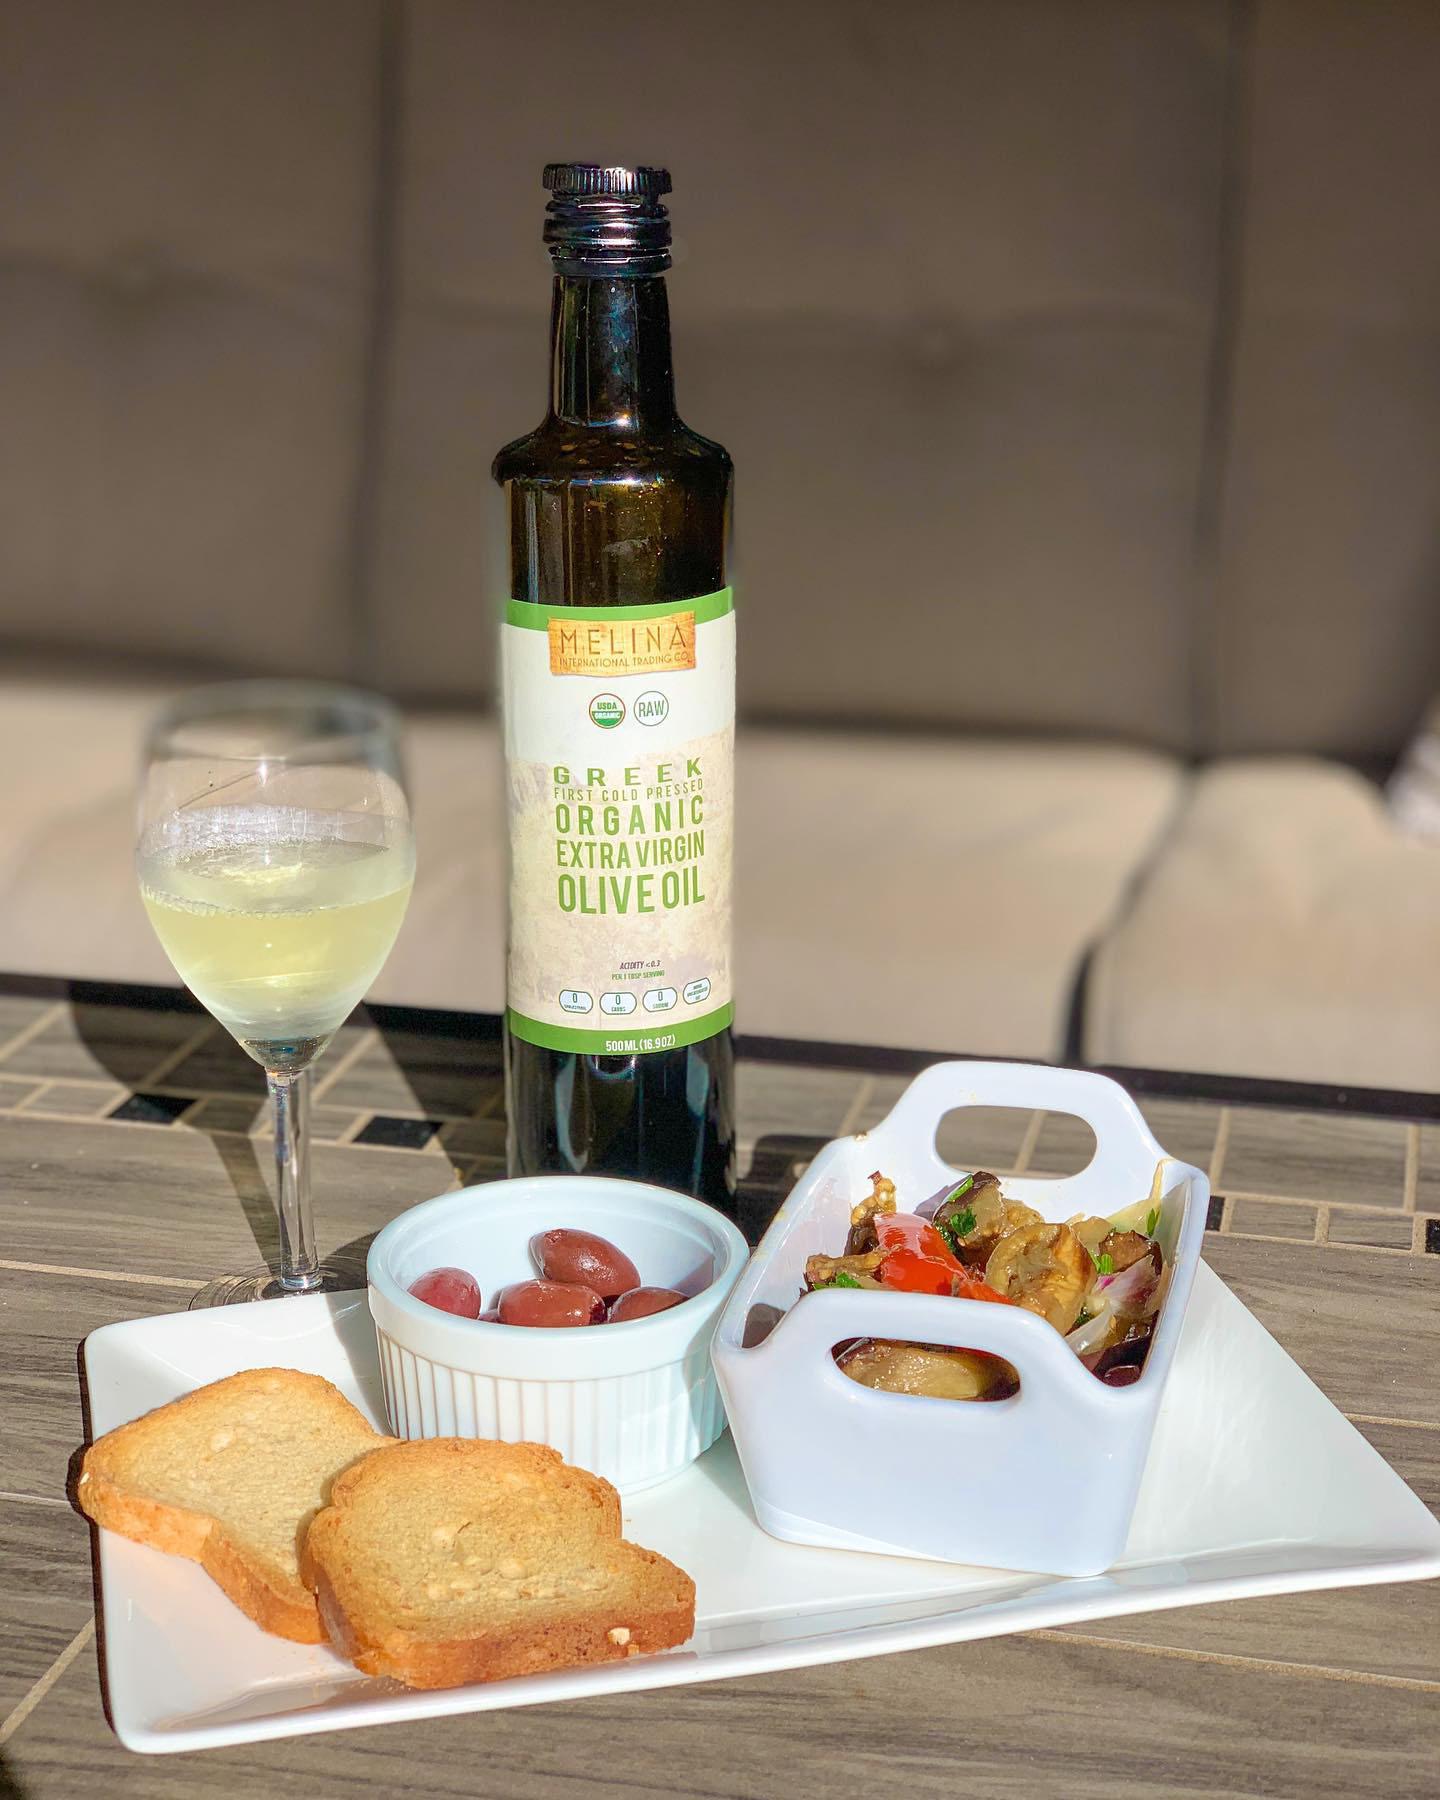 Bottle of Melina Extra Virgin Olive Oil next to olives, salad, and wine